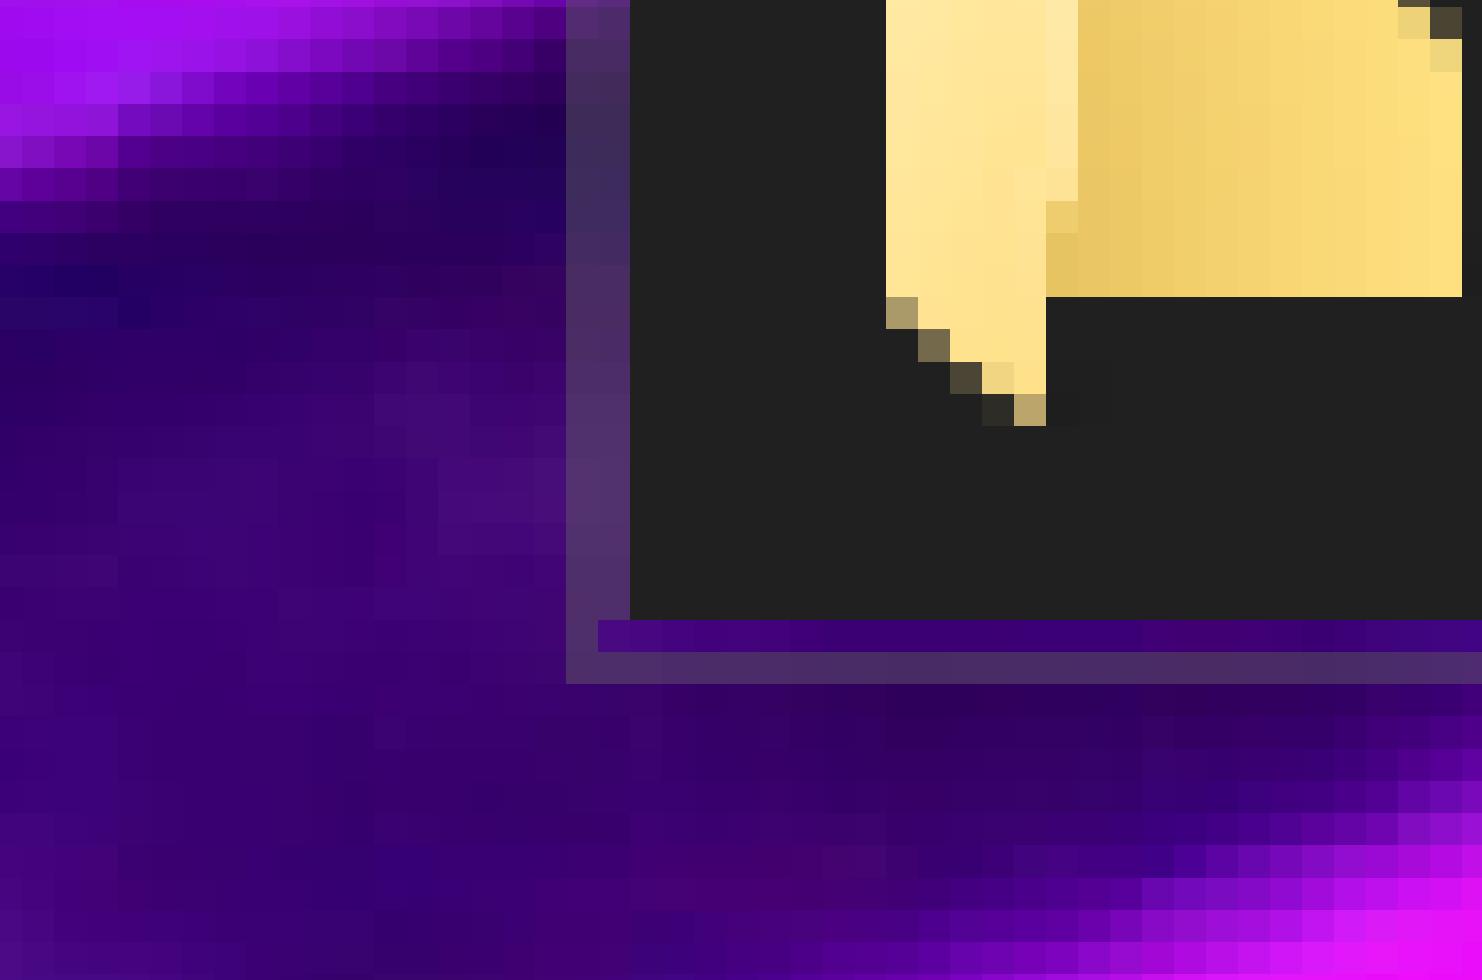 2021-10-05 21-48-39 Clipboard Image